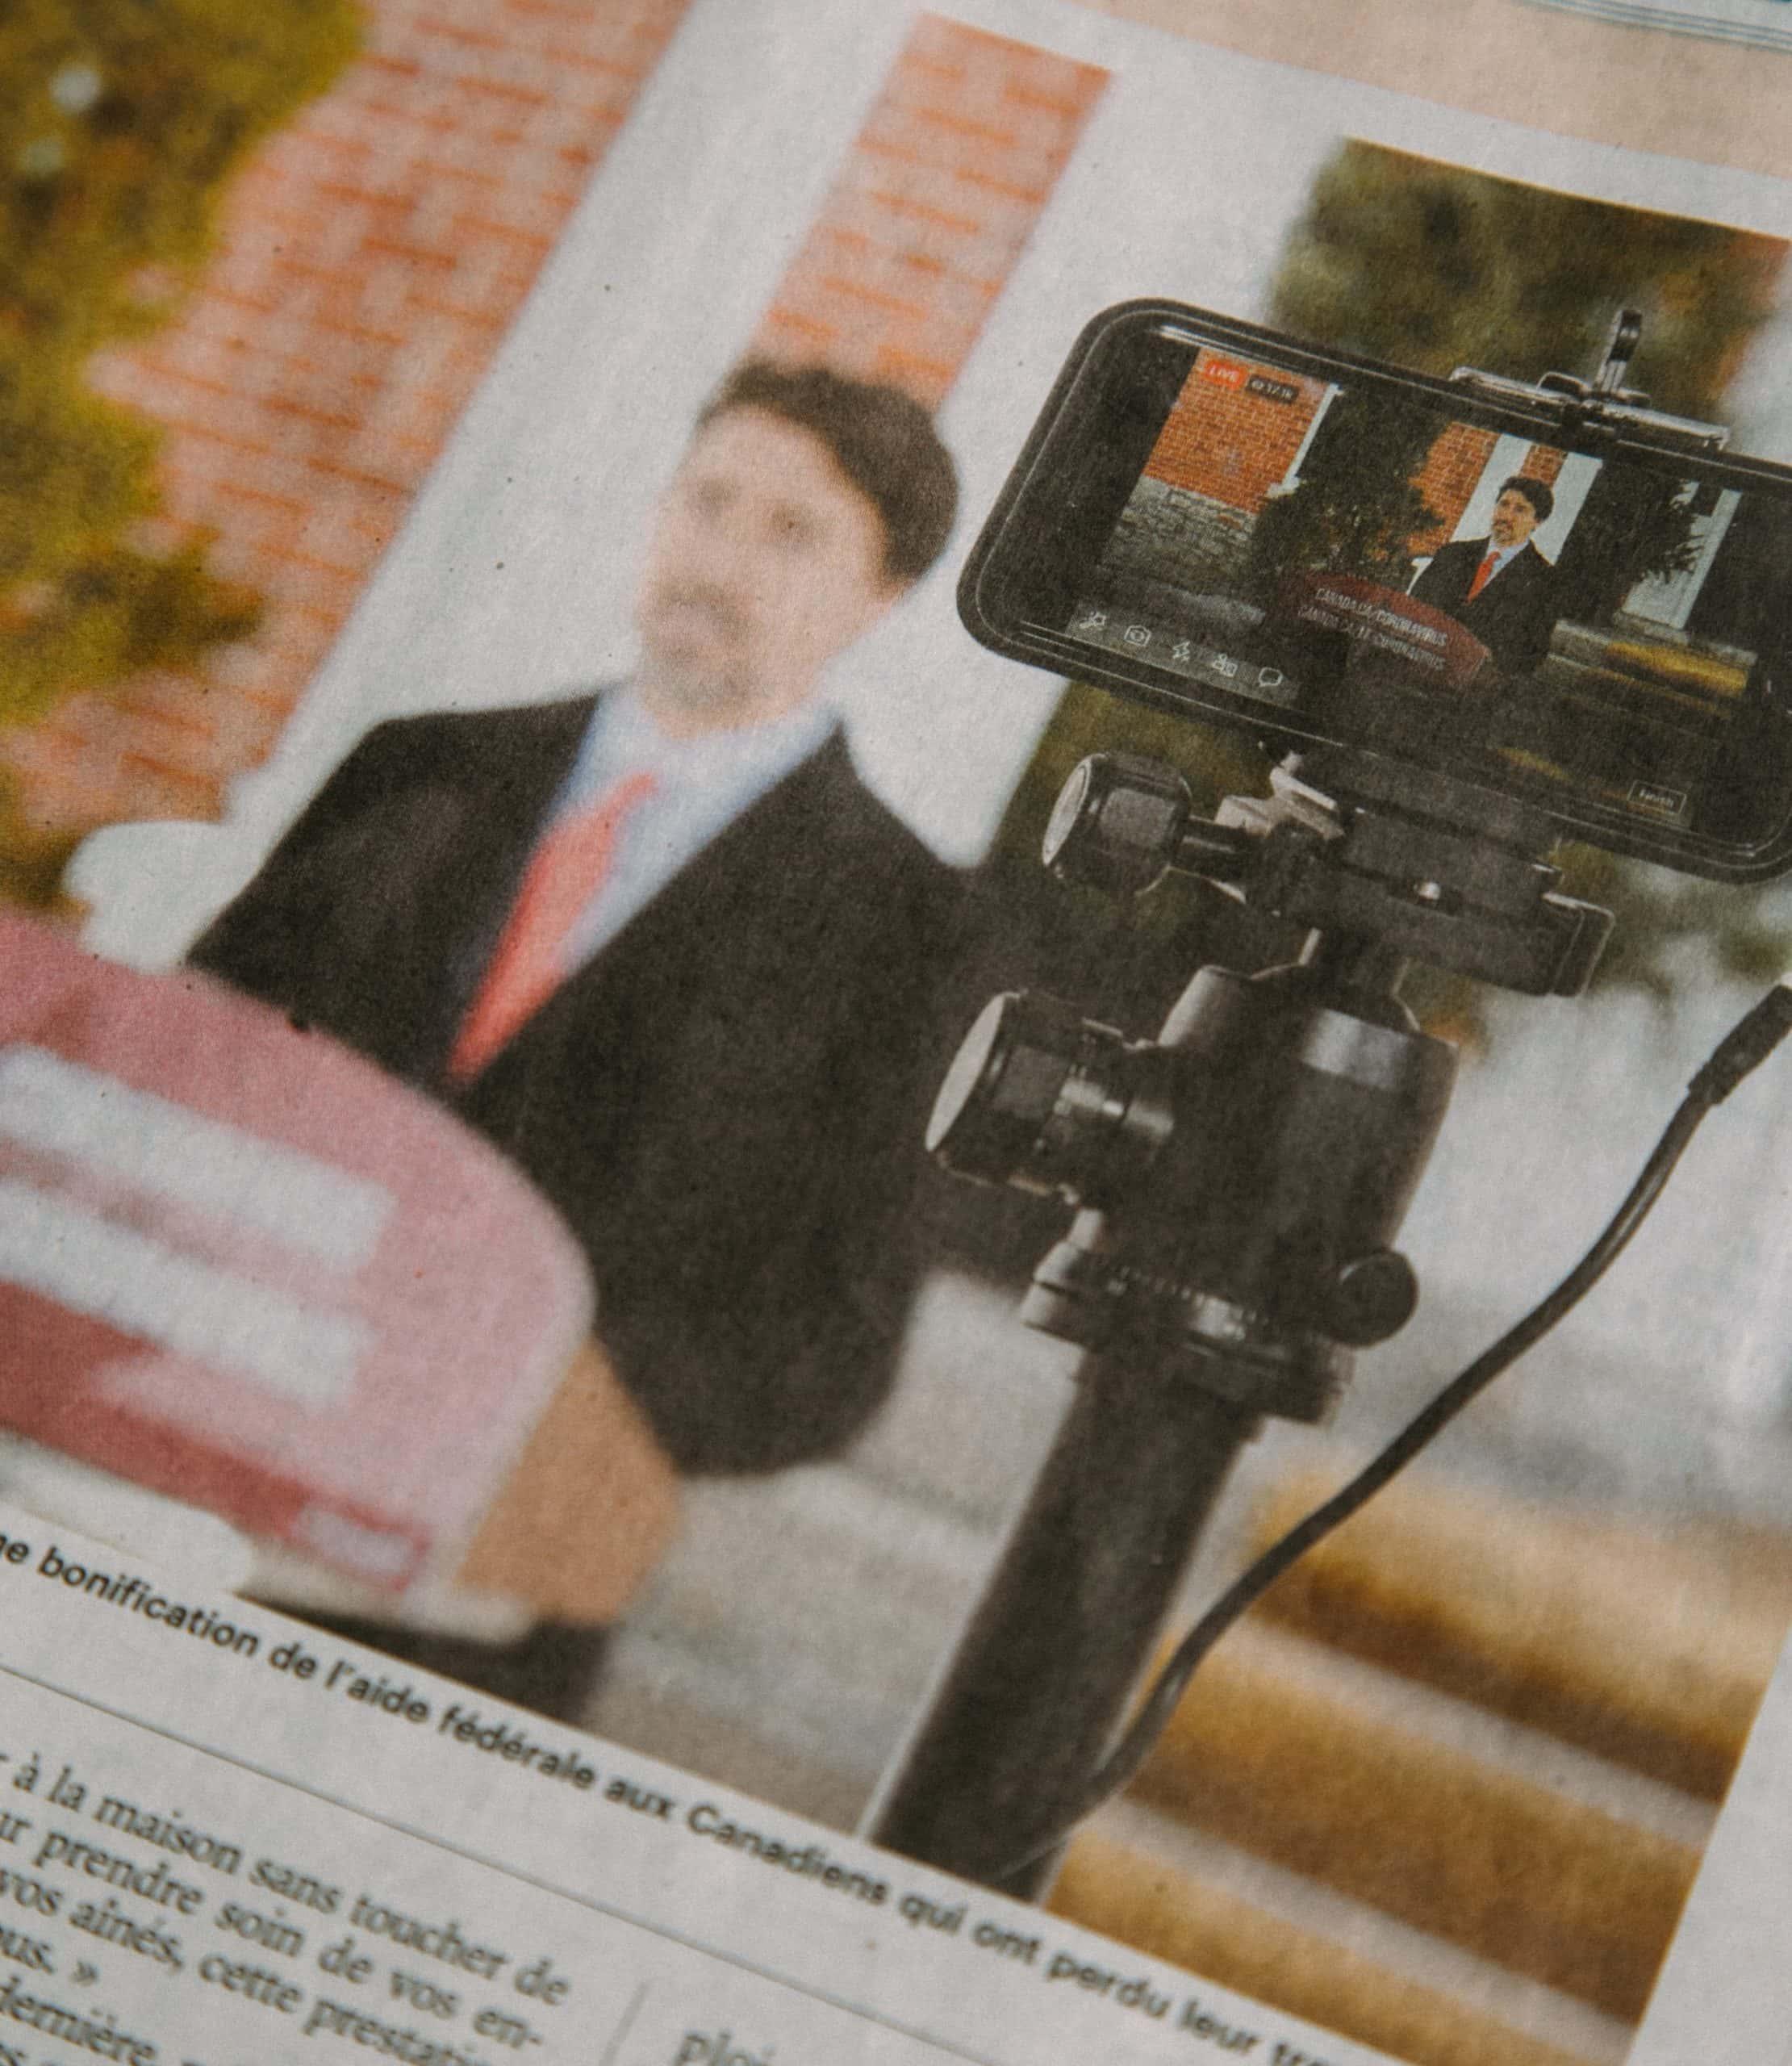 Video camera recording Trudeau